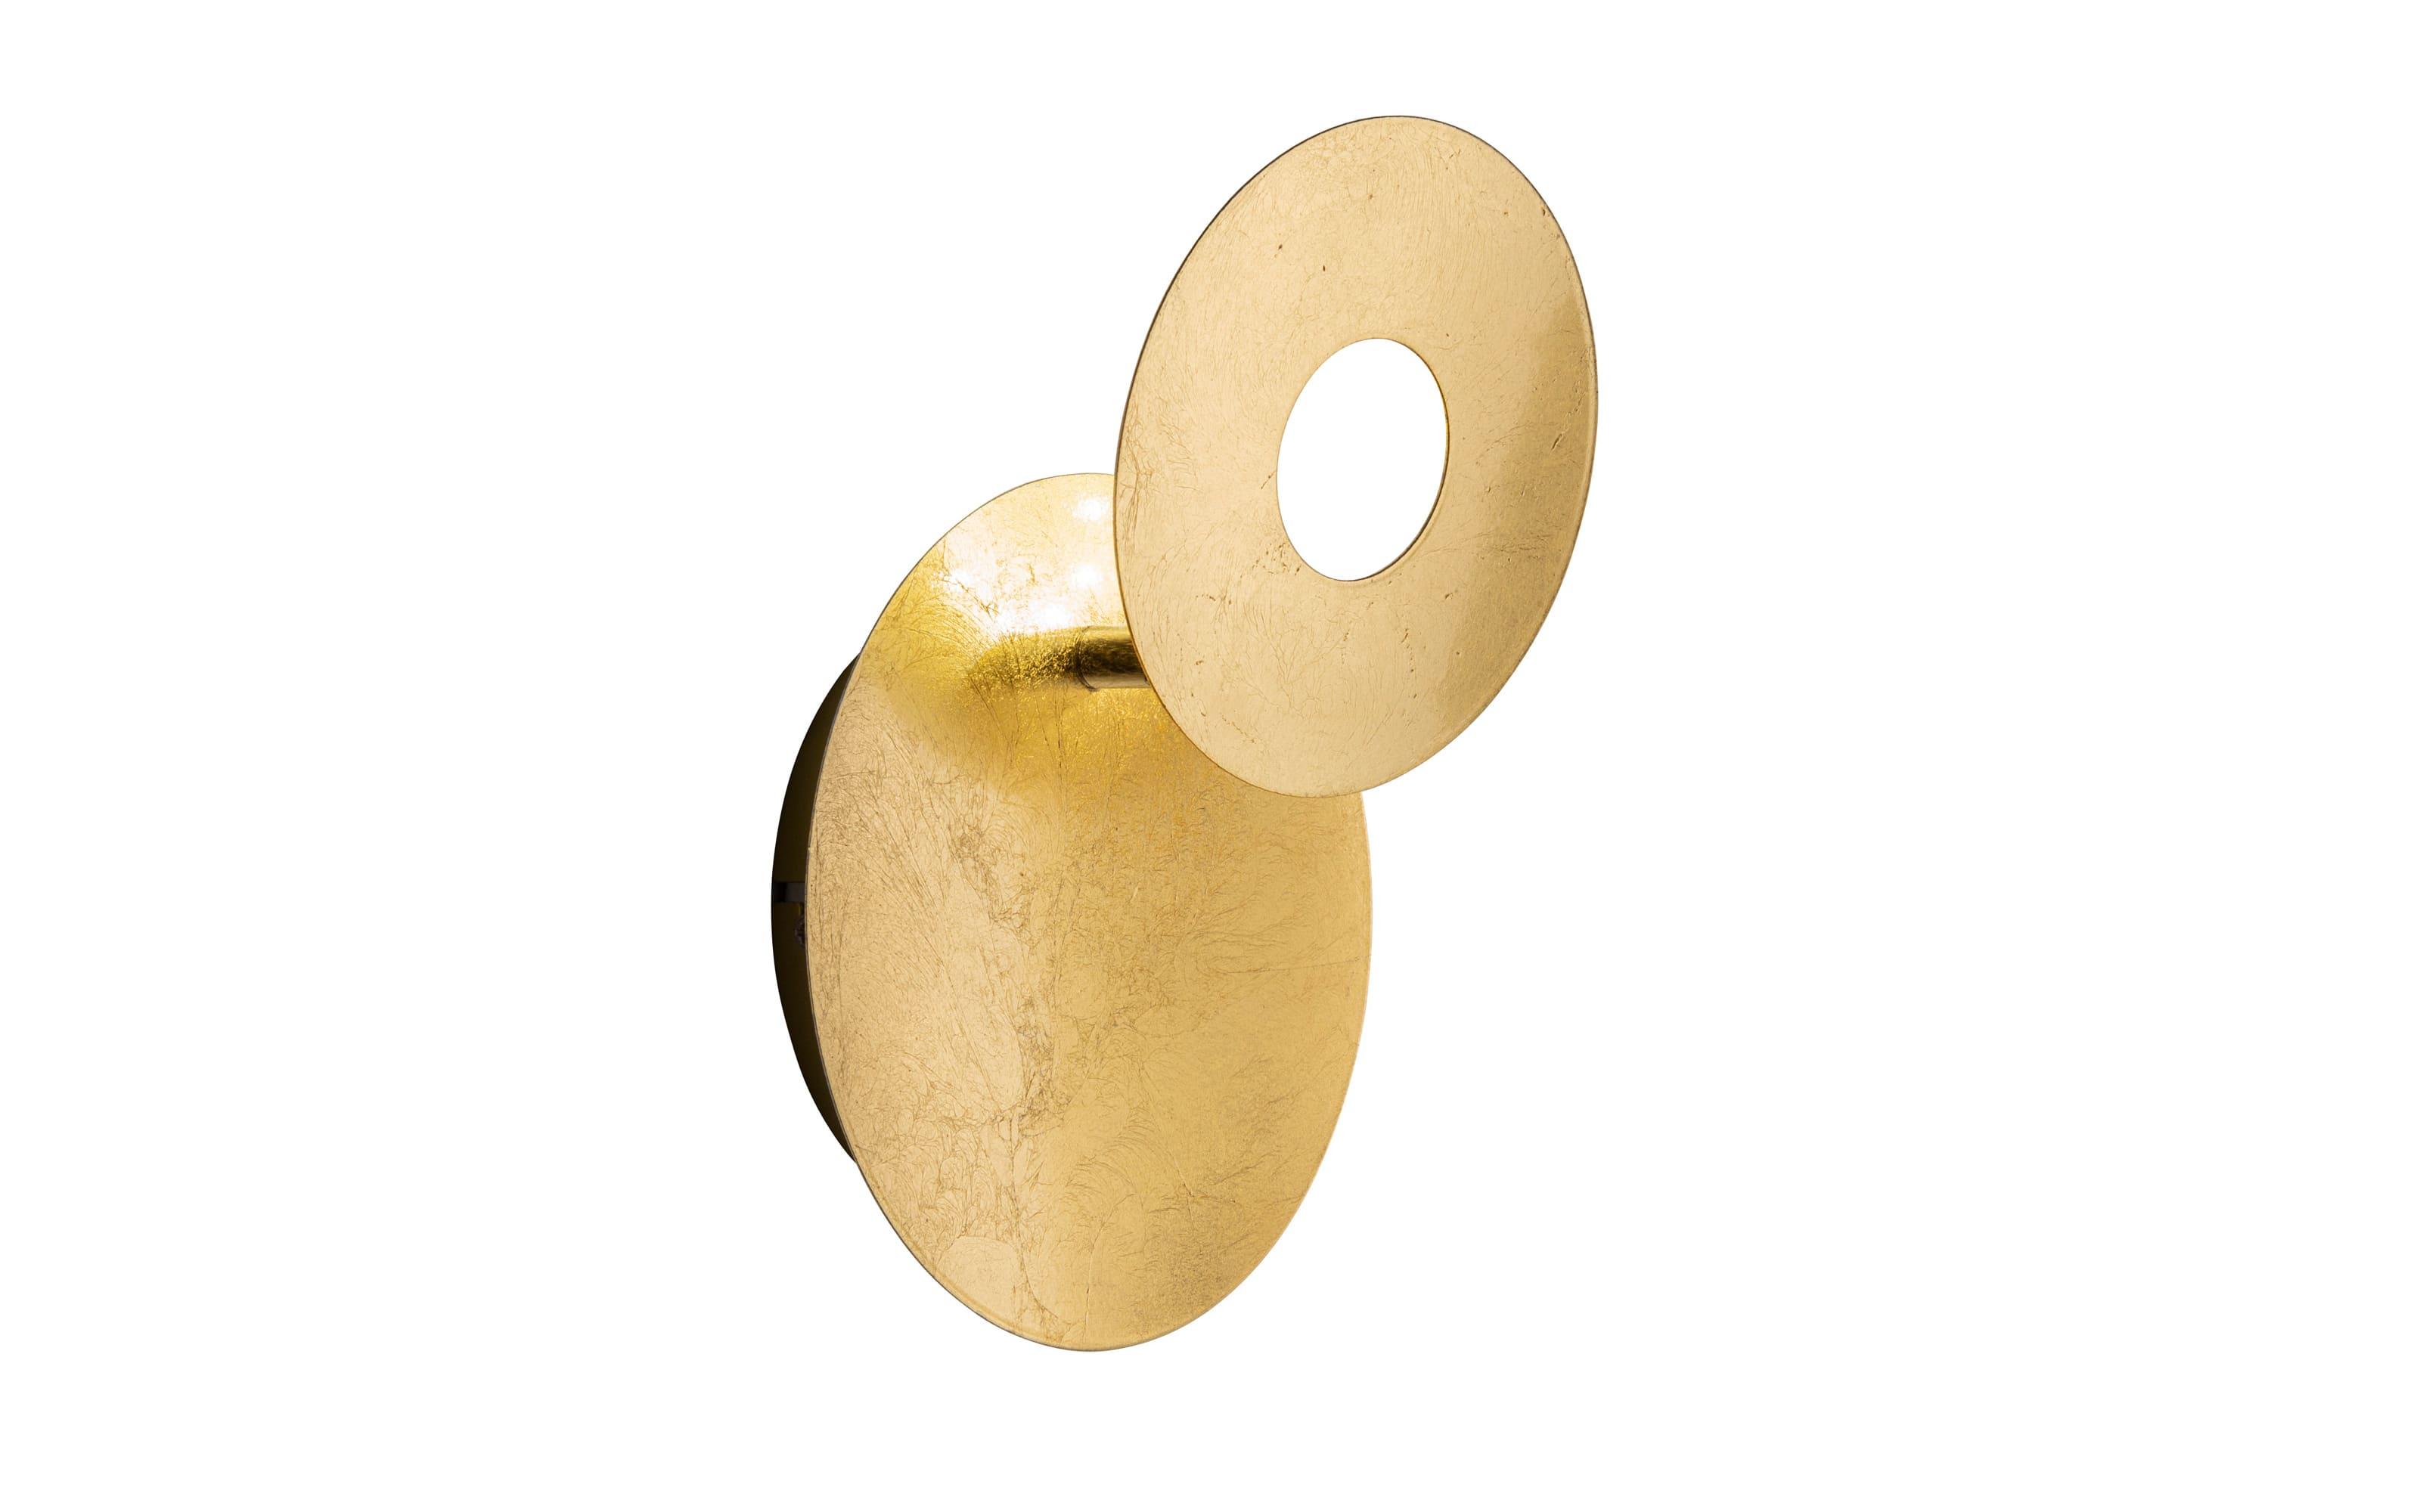 LED-Wandleuchte Afir in goldfarbig